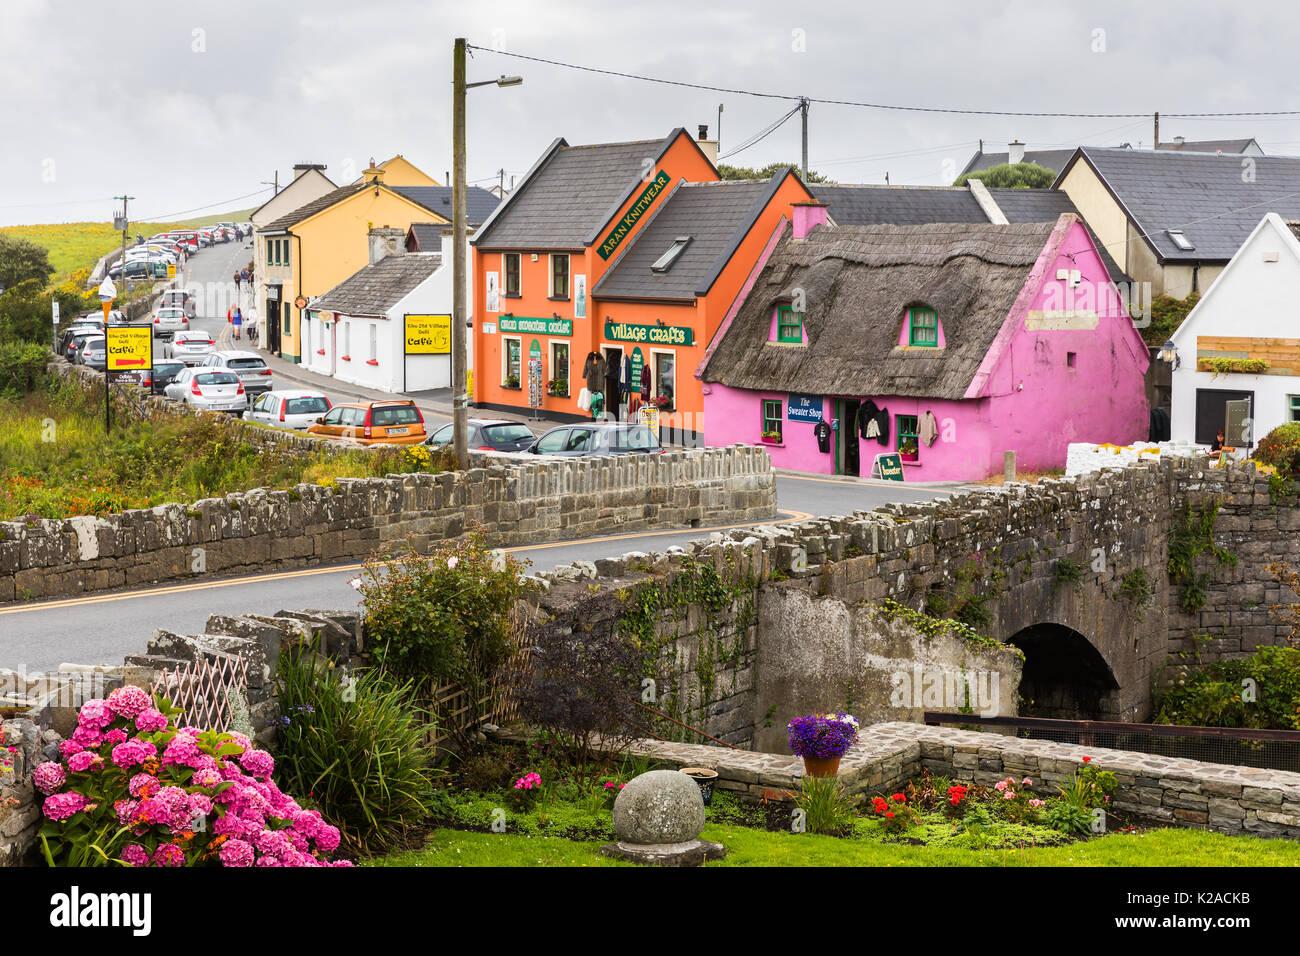 The colourful coastal village of Doolin in County Clare, Ireland Stock Photo: 156352095 - Alamy